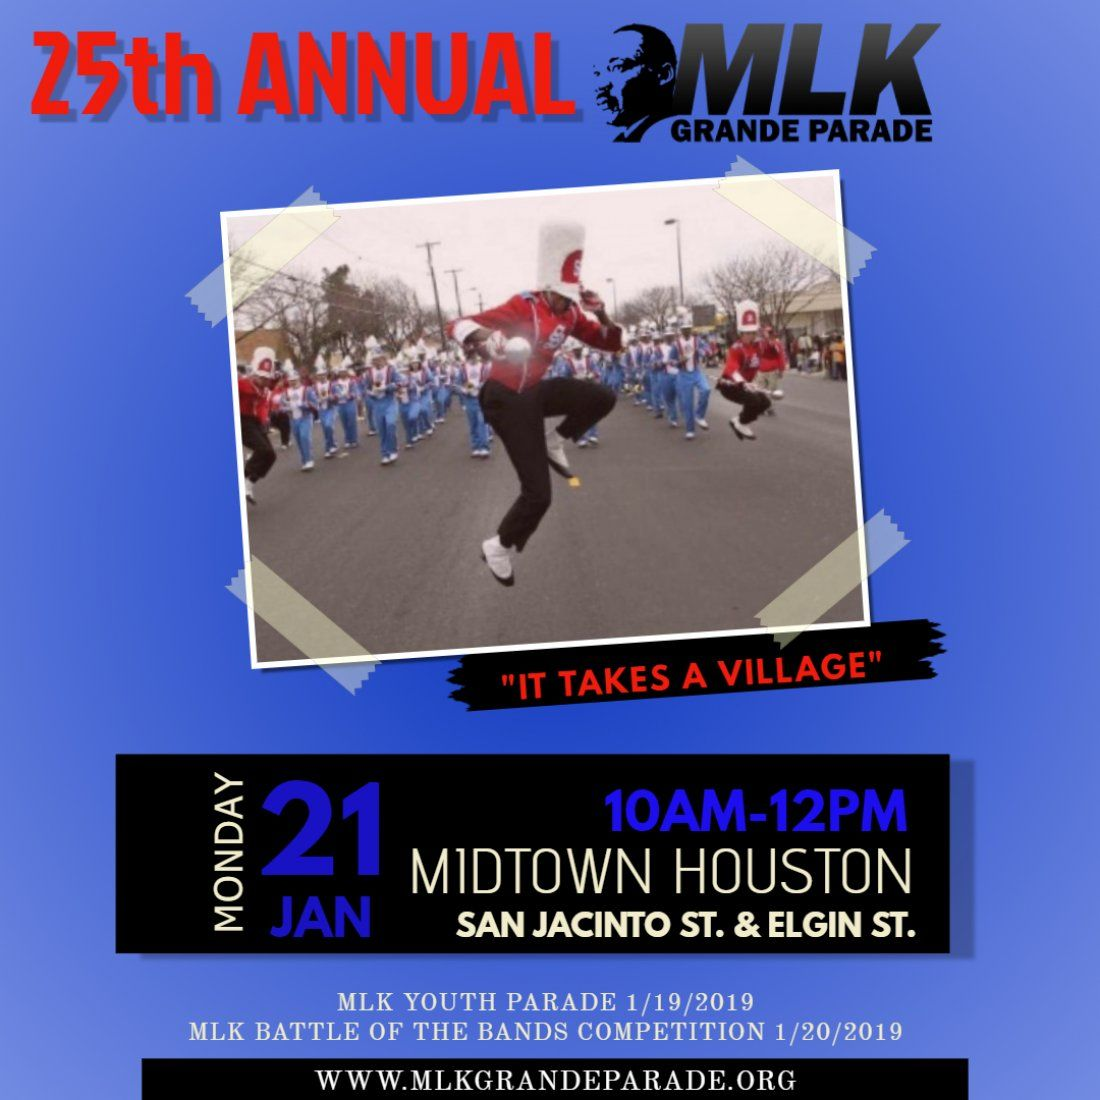 25th Annual MLK Grande Parade Midtown Housyton-2019